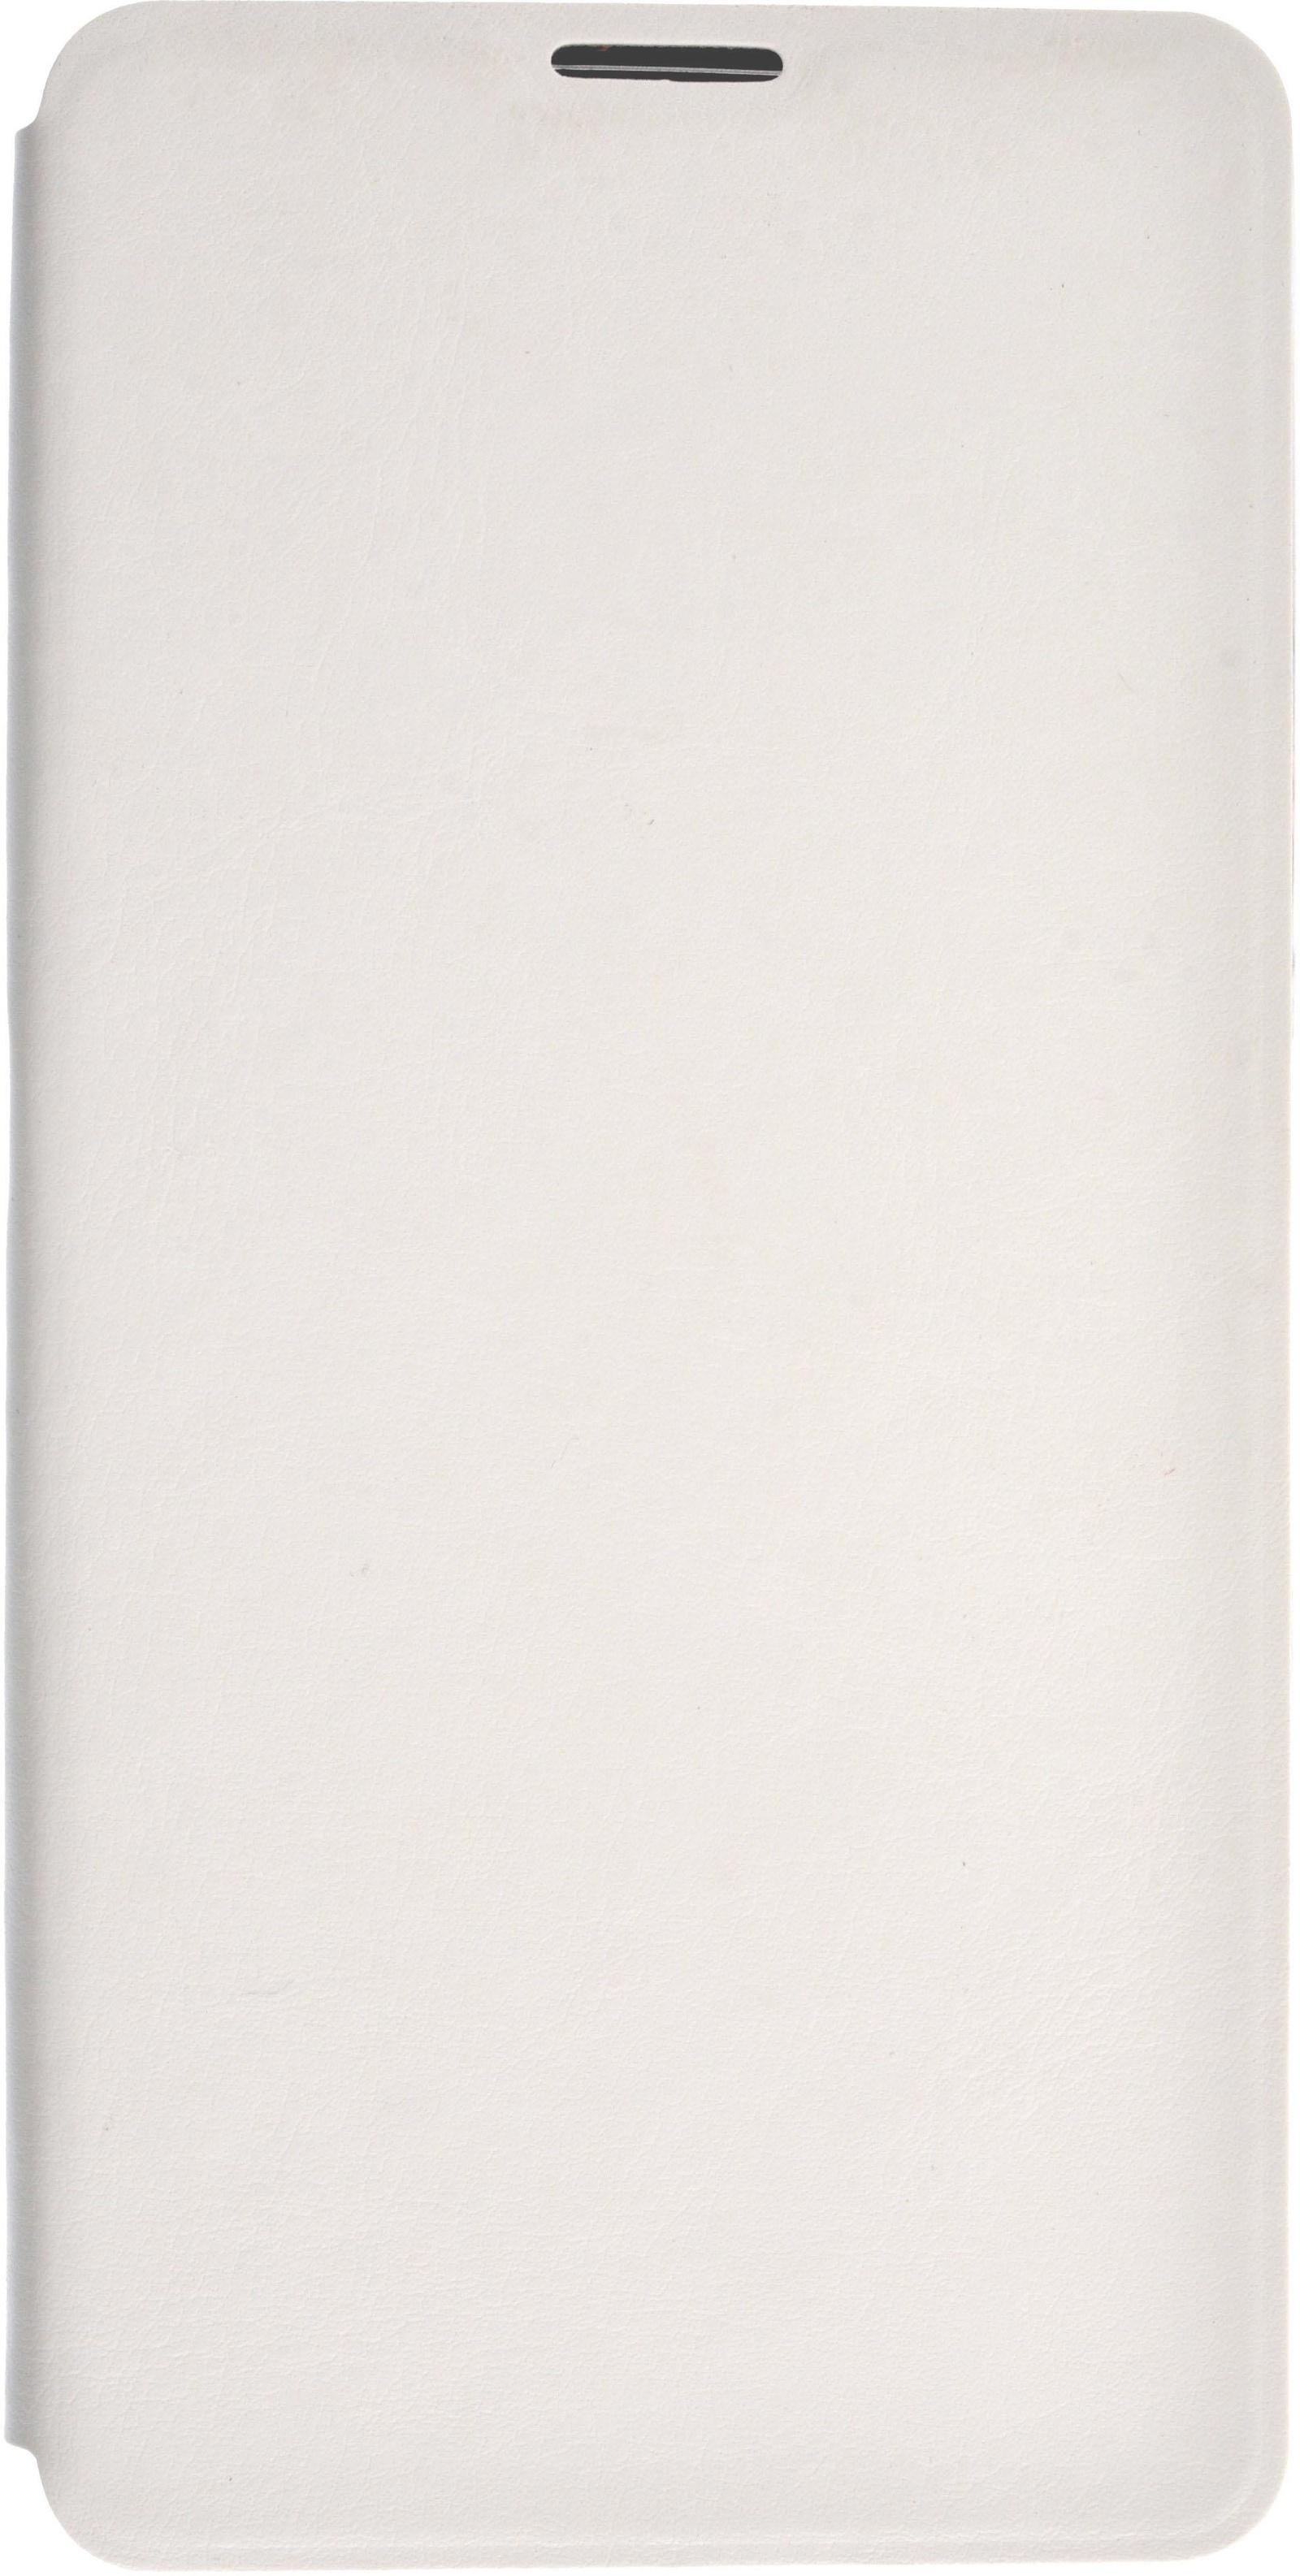 цена на Чехол для сотового телефона skinBOX Lux, 4630042527416, белый